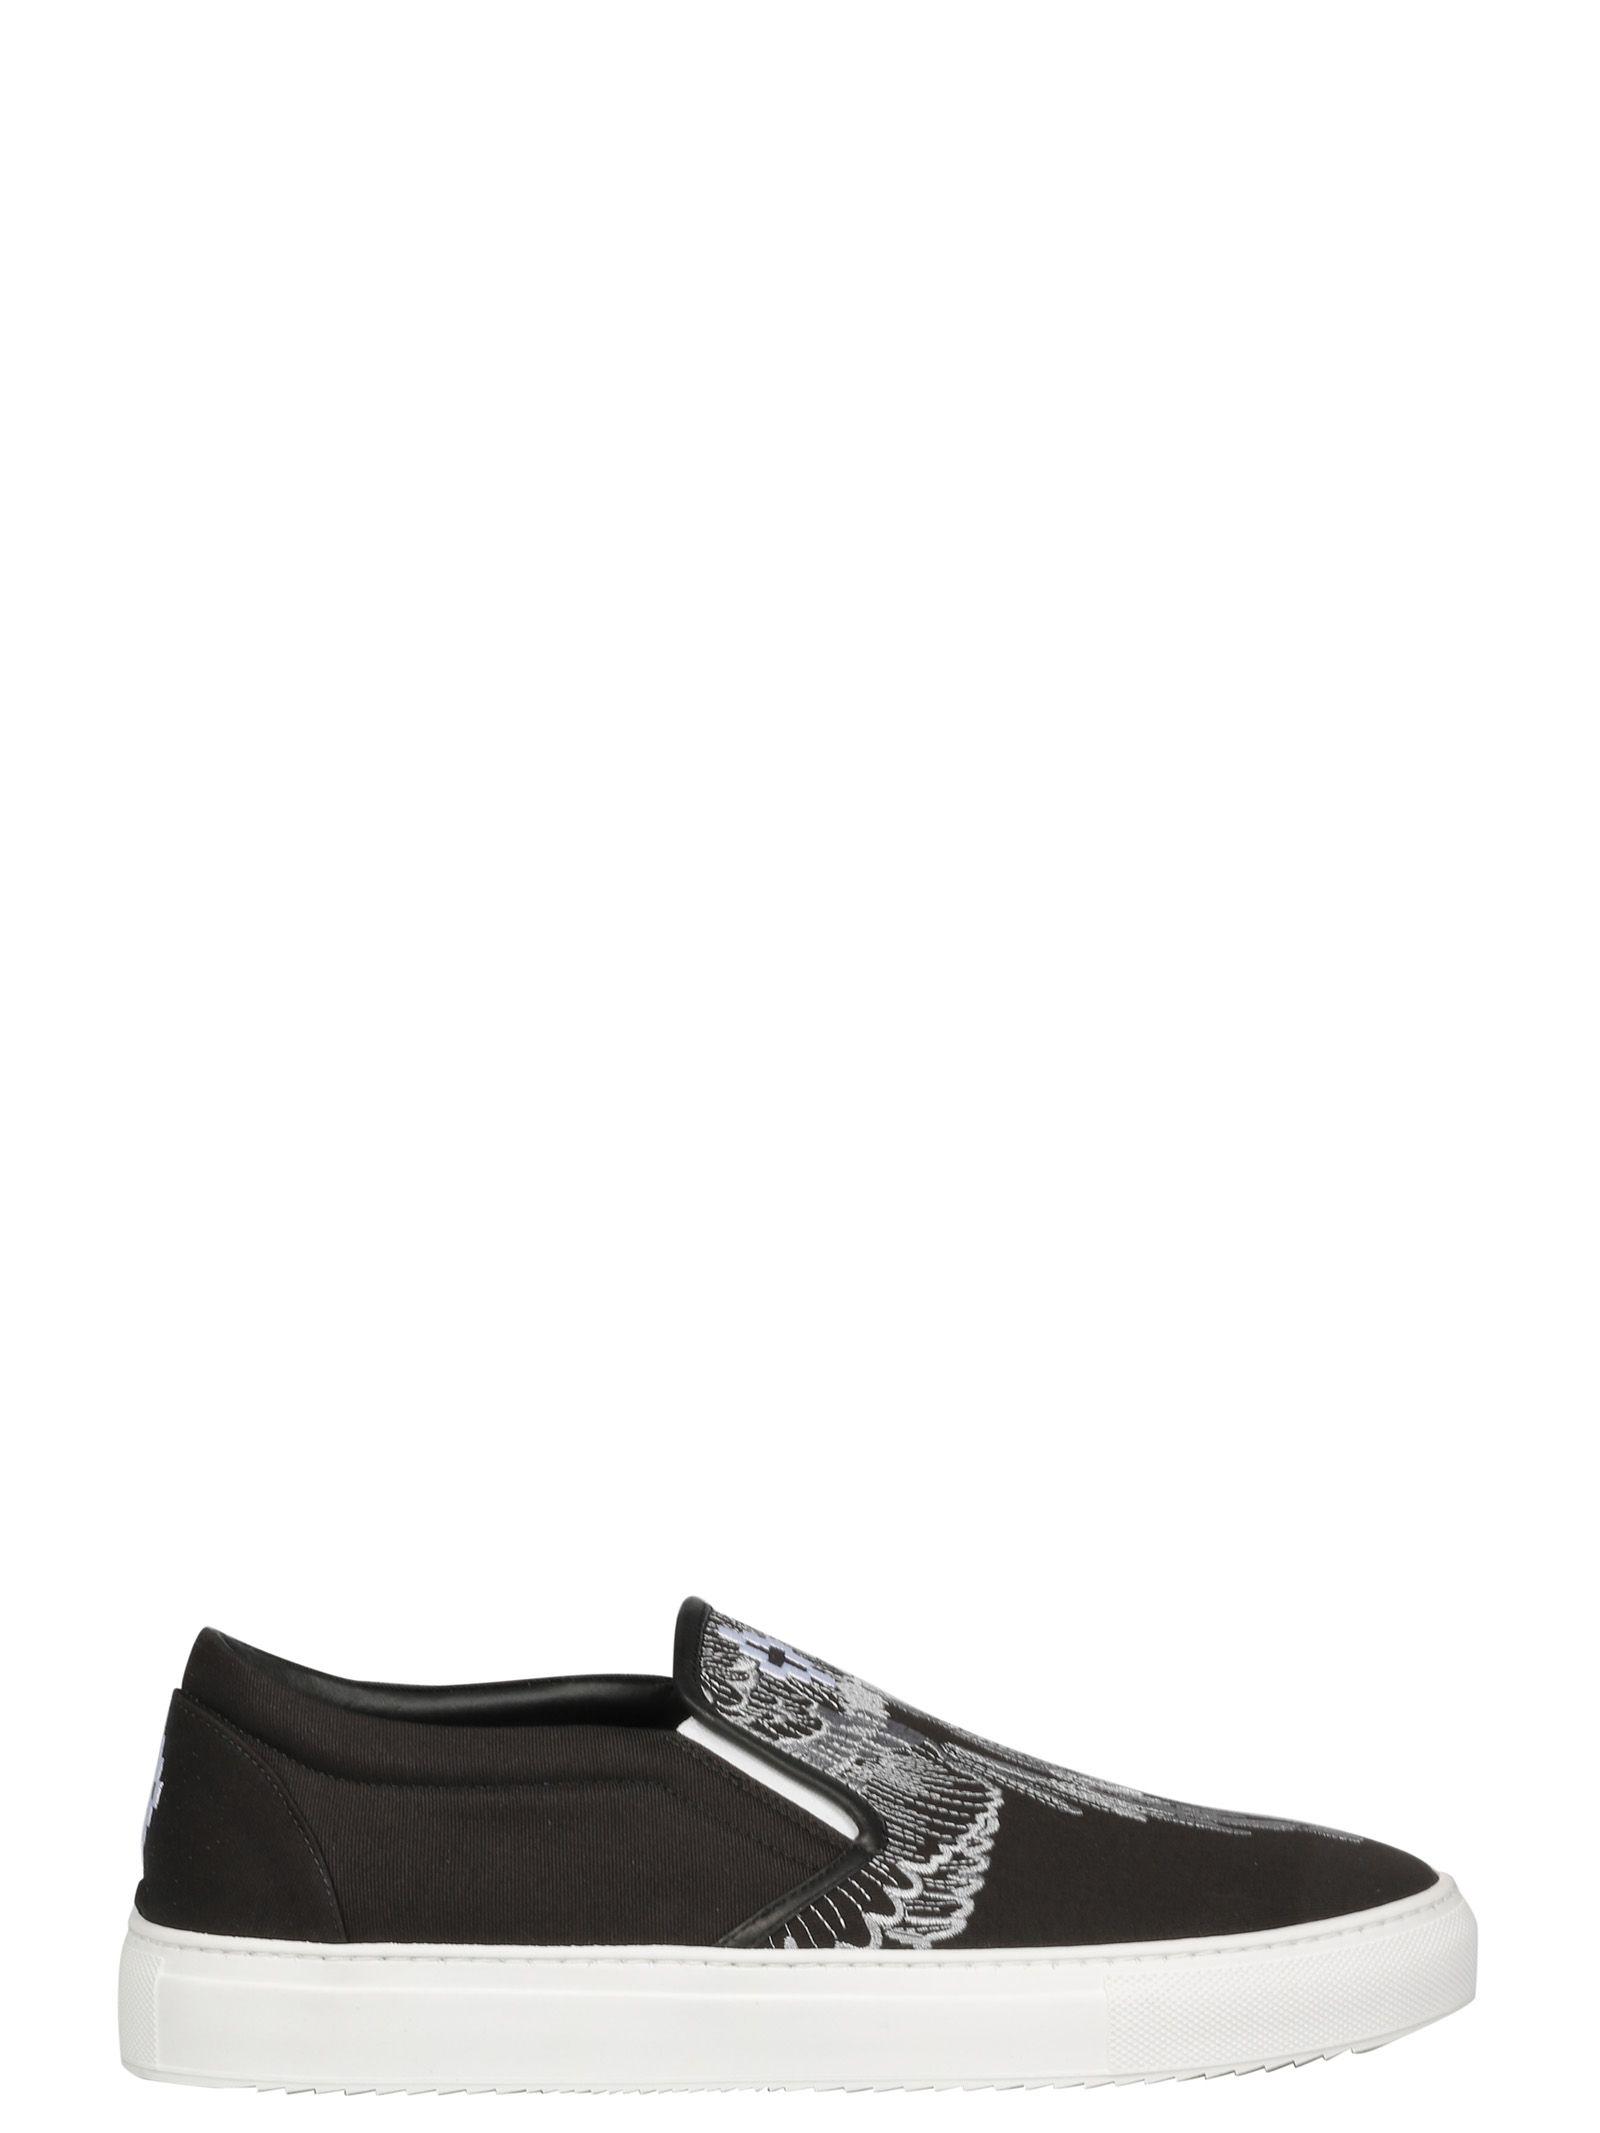 Marcelo Burlon Slip-on Printed Sneakers